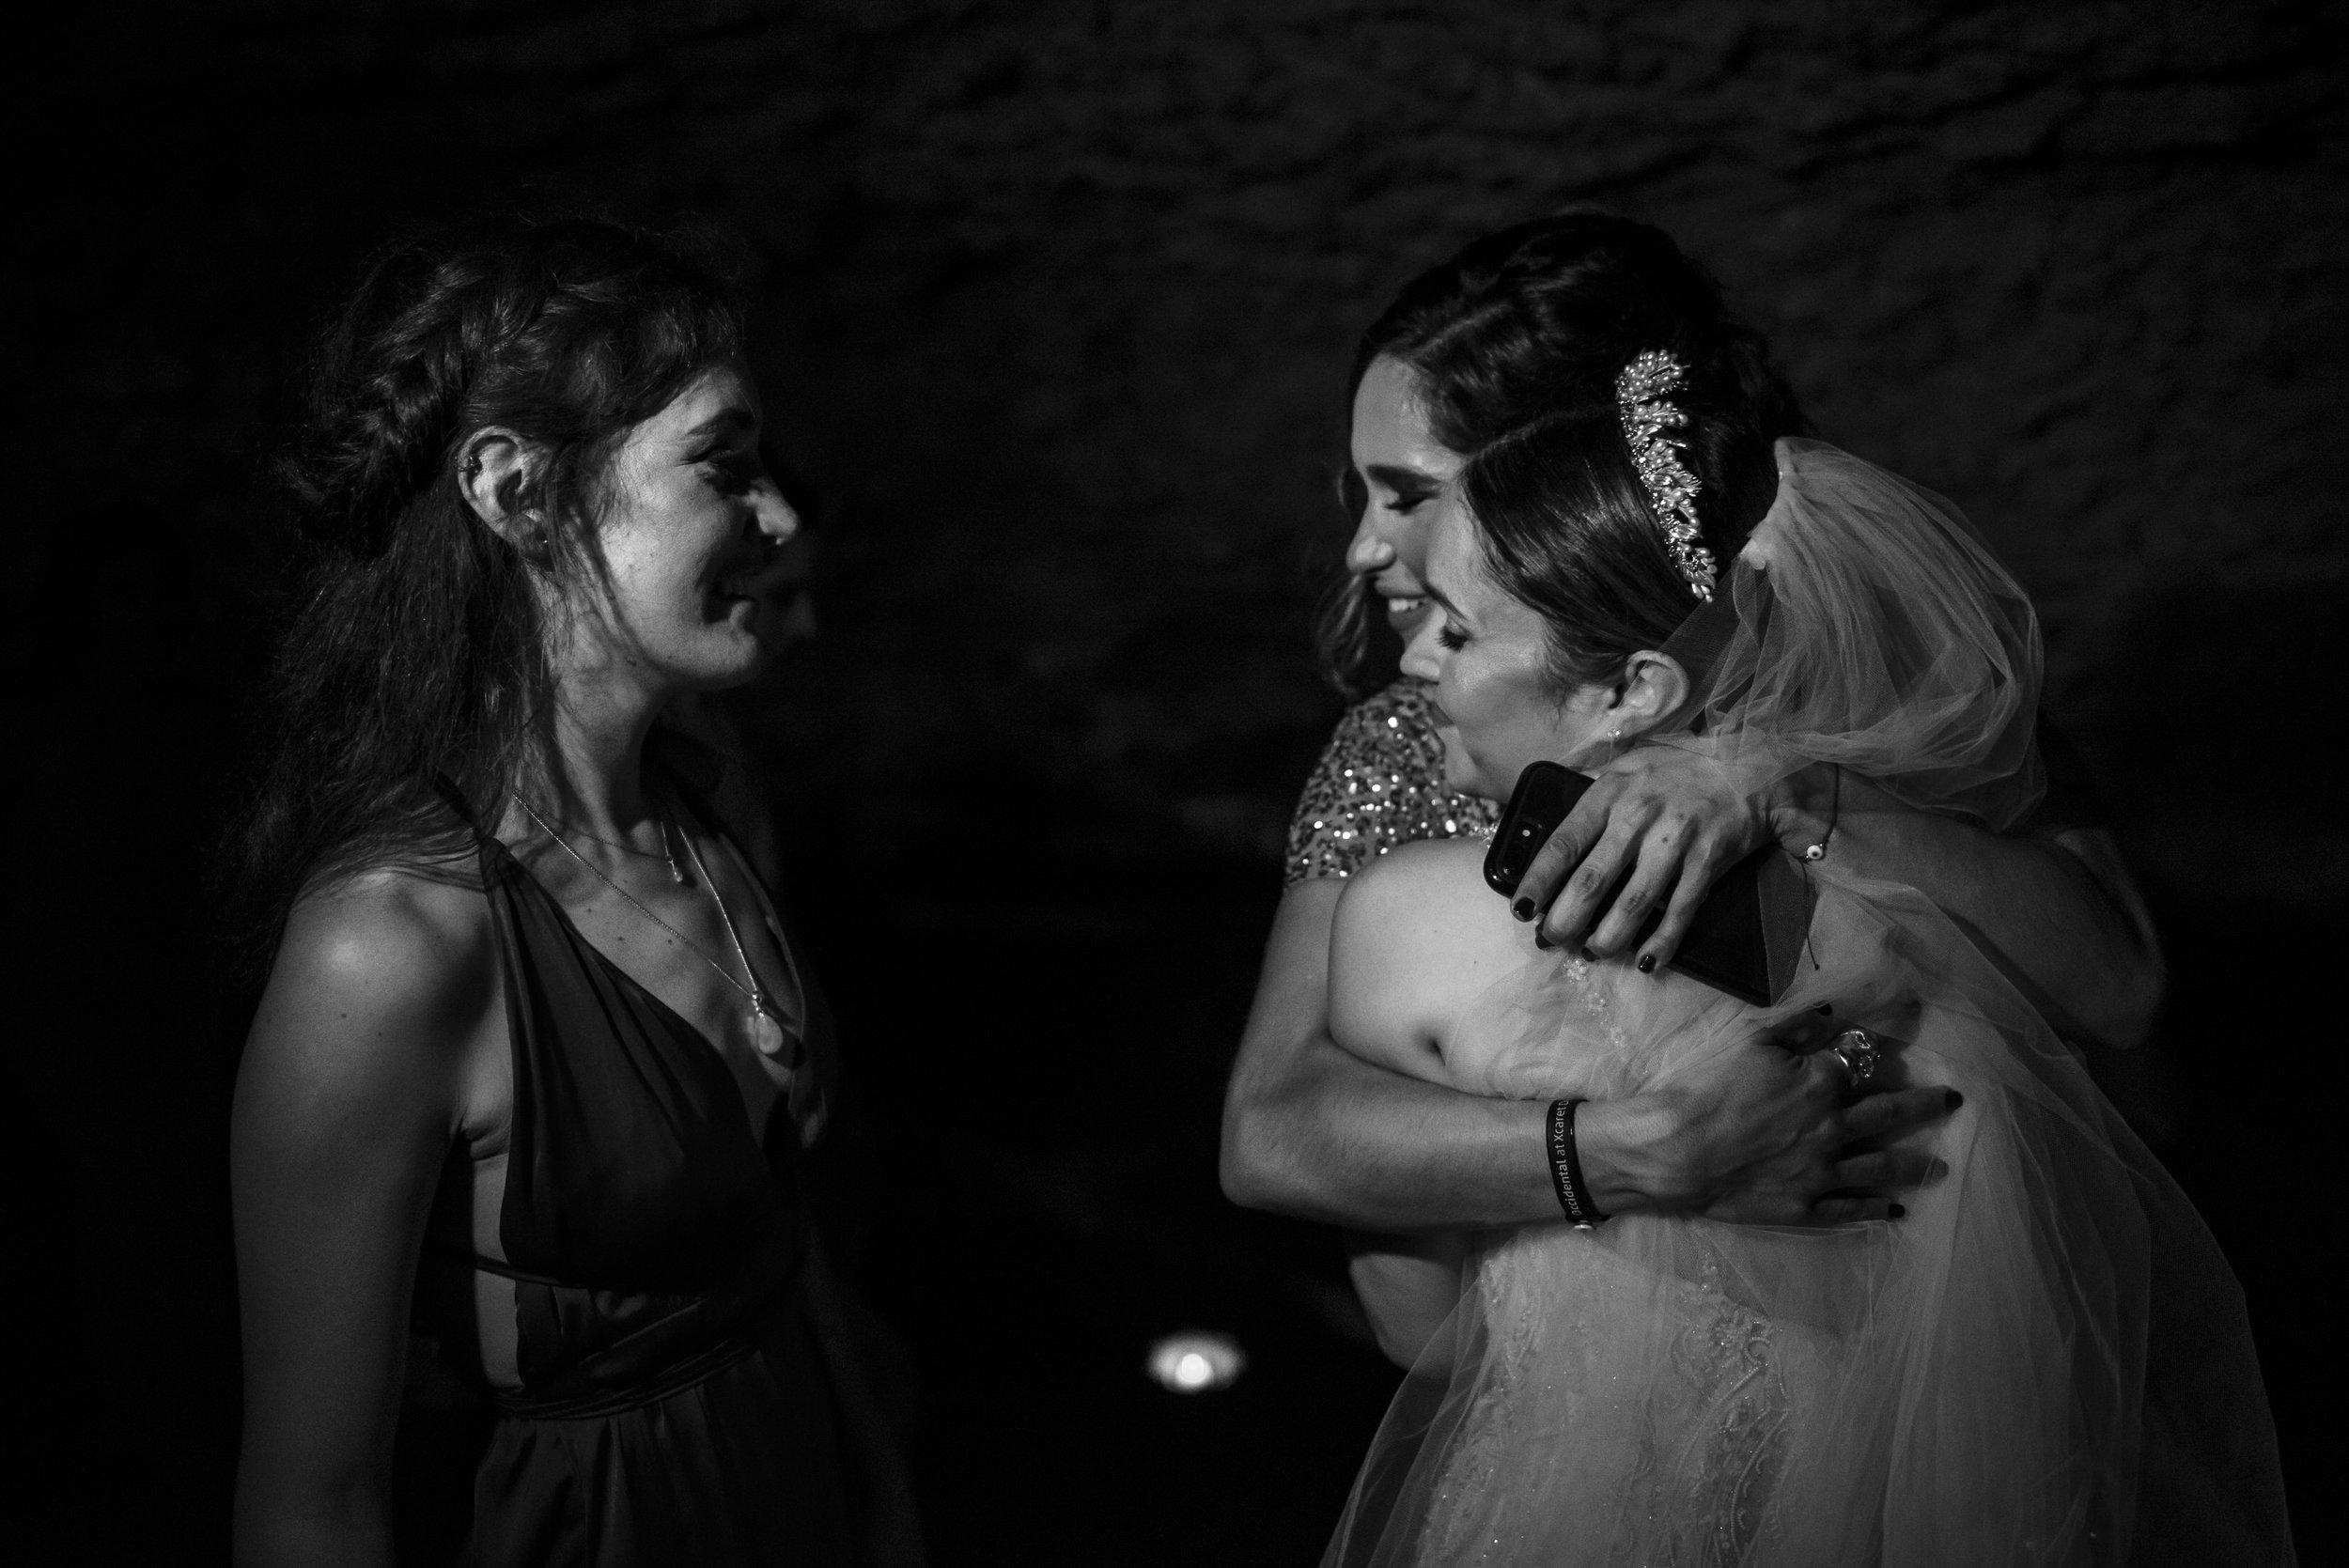 cancun_wedding_photographer_mexico (79).jpg